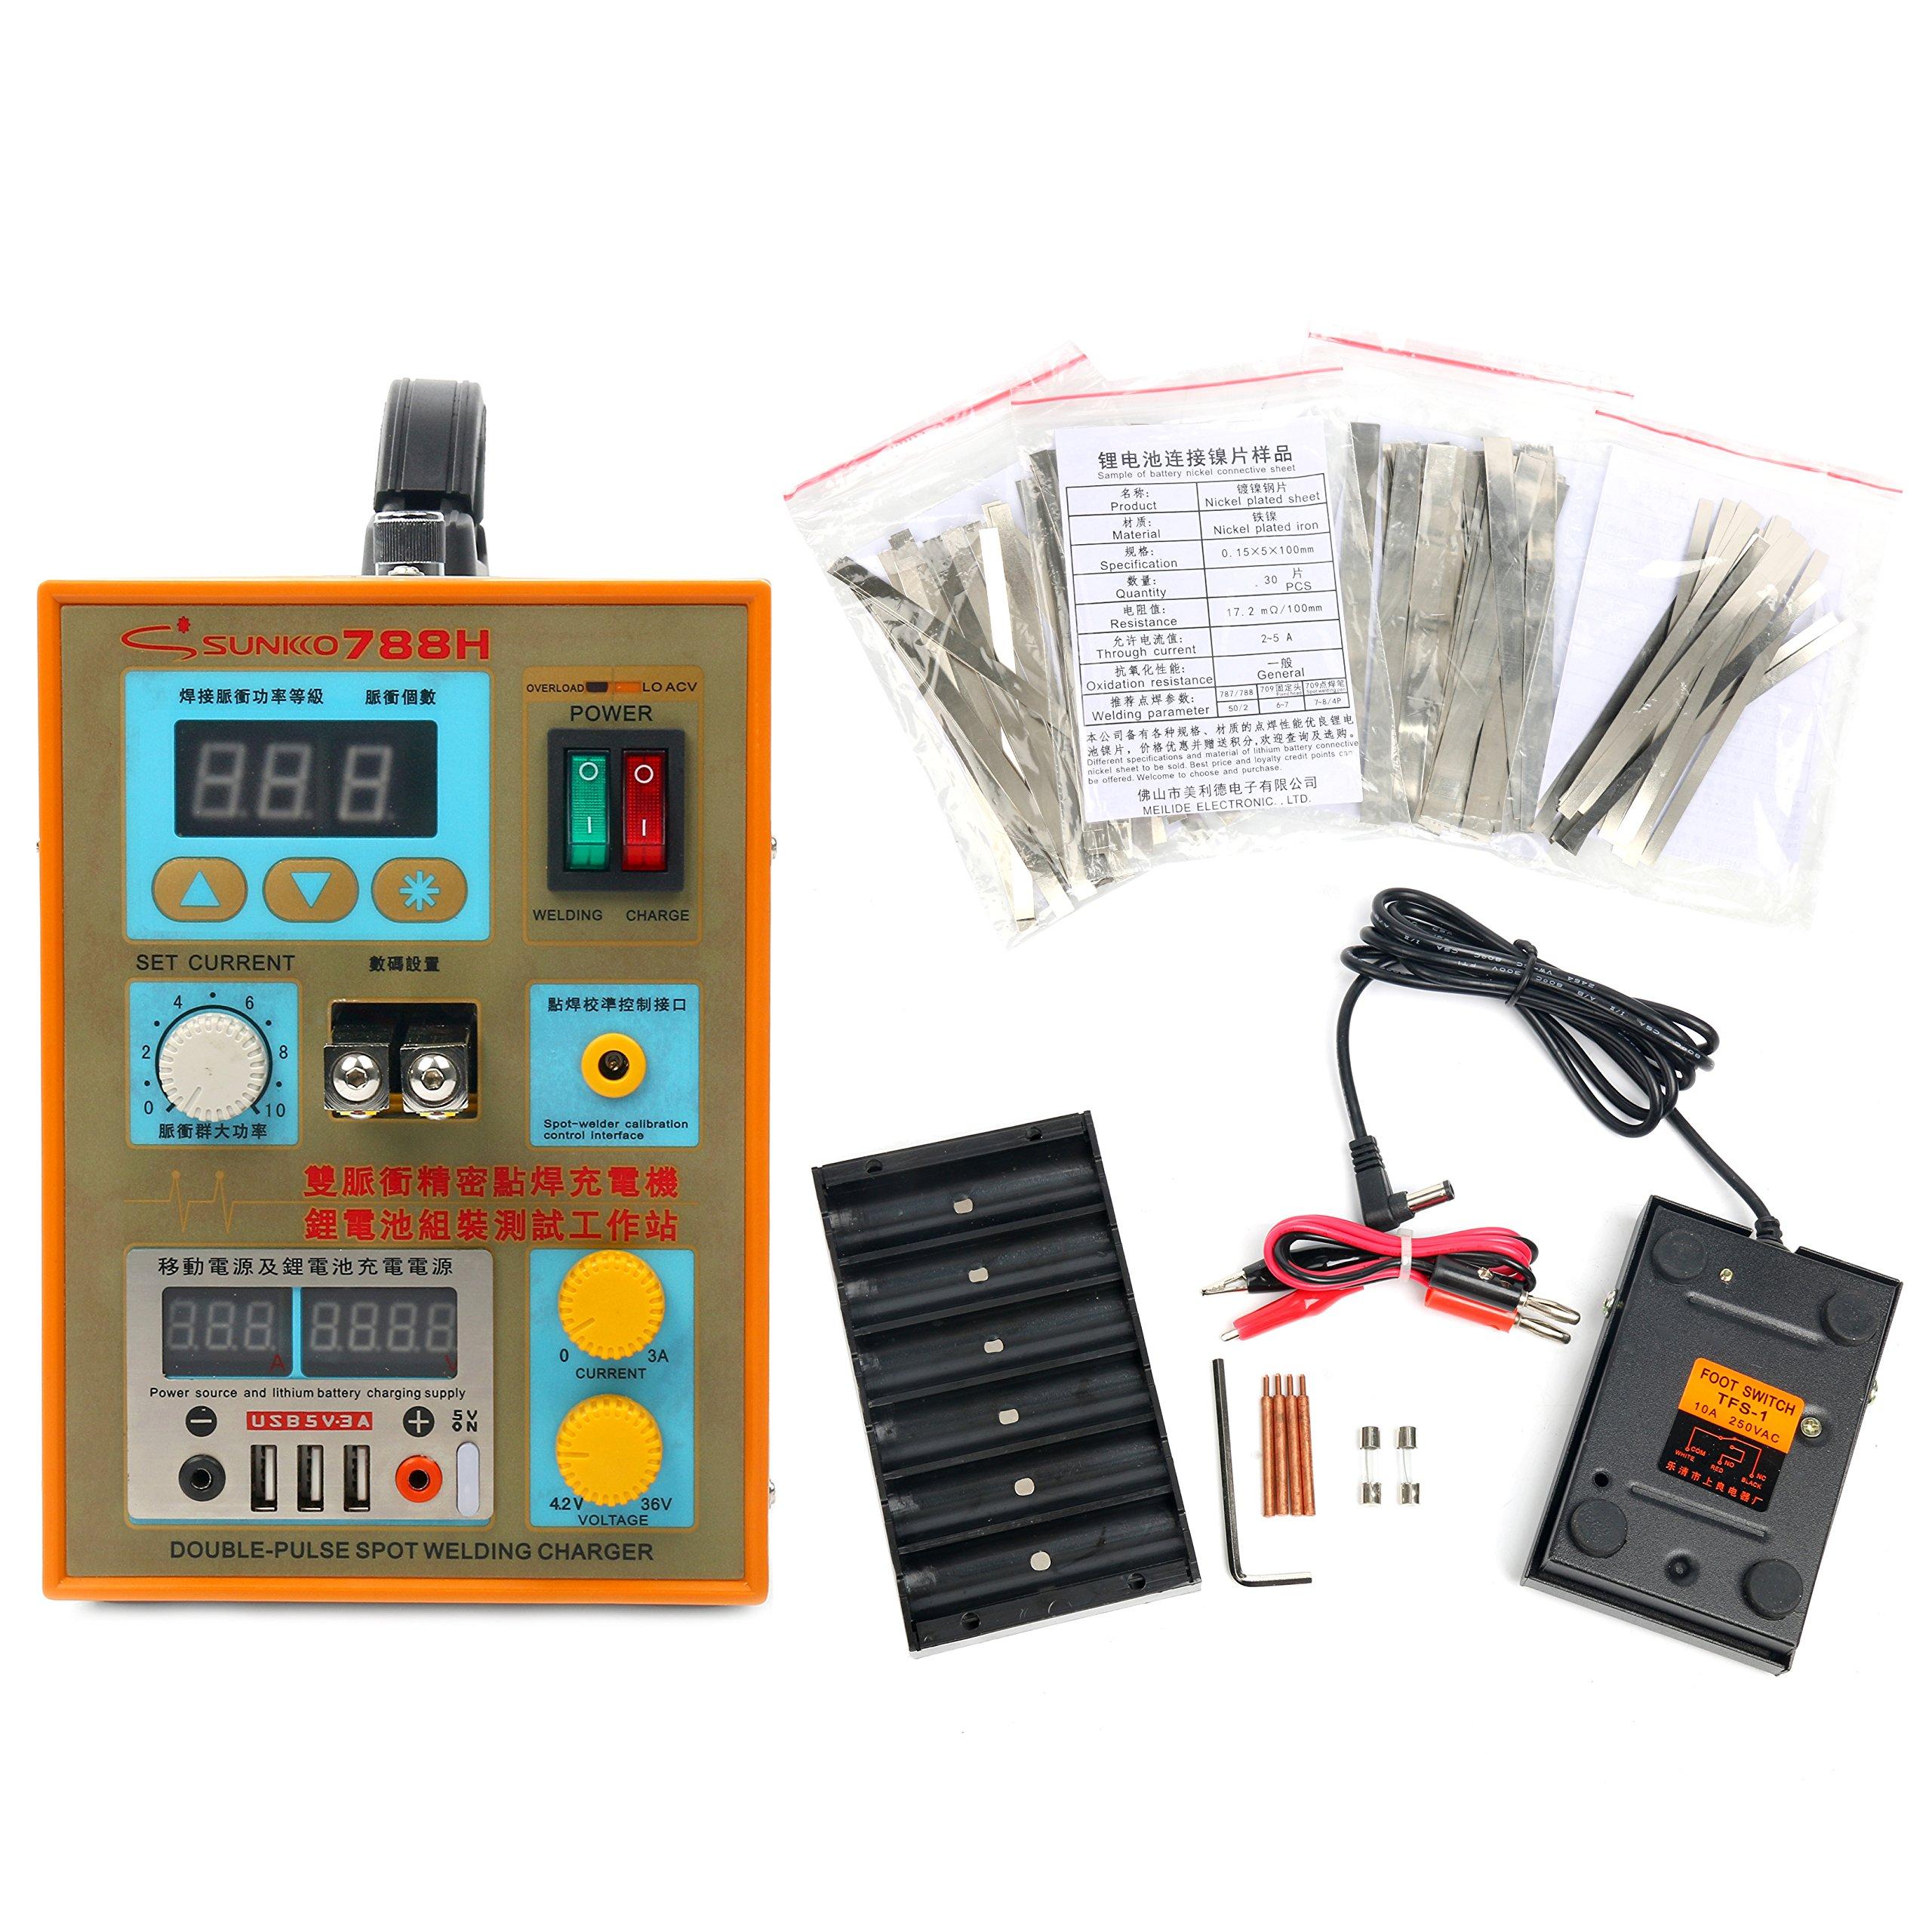 SUNKKO S788H-USB Preciston pulse spot welder+CC-CV Charge+Power bank test